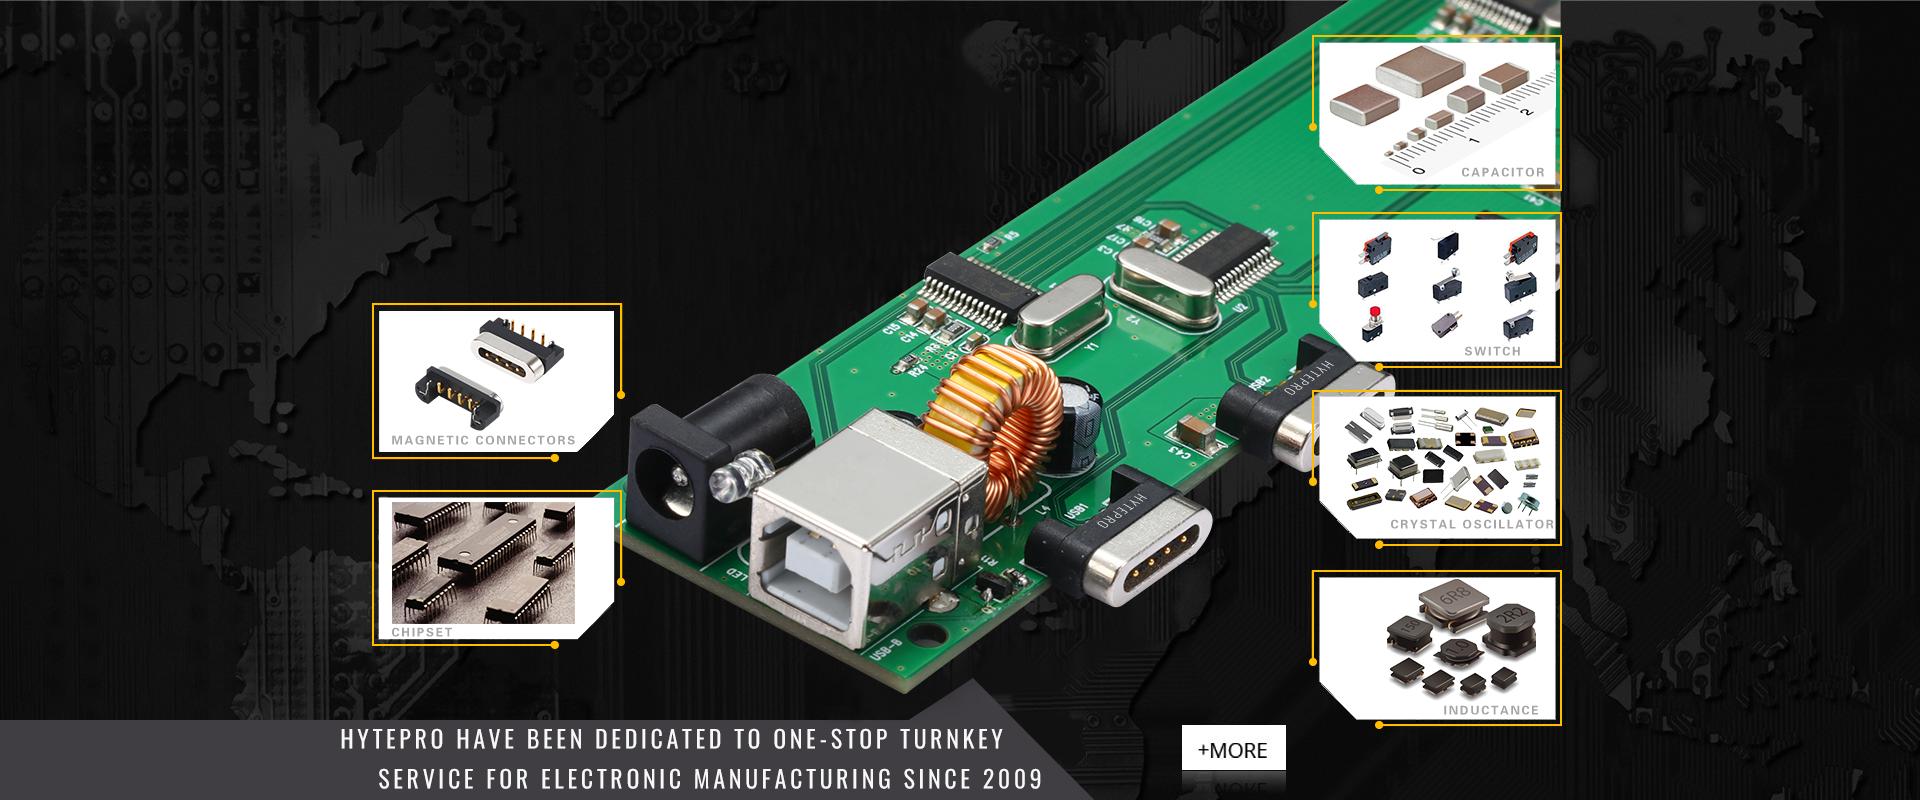 7port usb 2.0 hub ve usb ethernet i/o adaptörü elektronik parçalar pcb